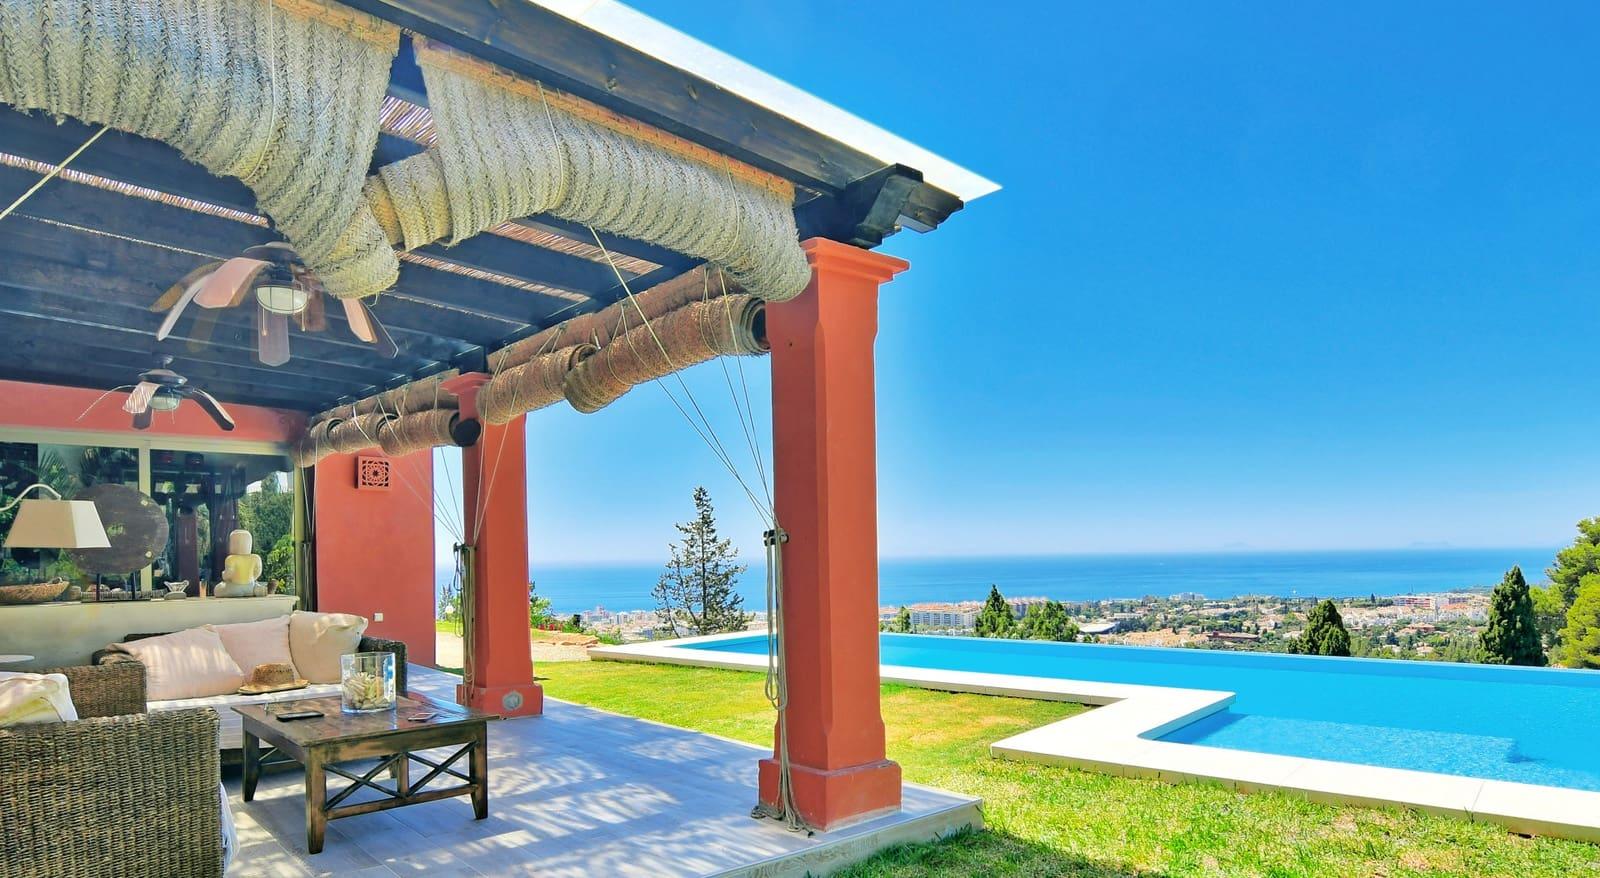 4 bedroom Villa for sale in Marbella with pool garage - € 1,995,000 (Ref: 4643502)